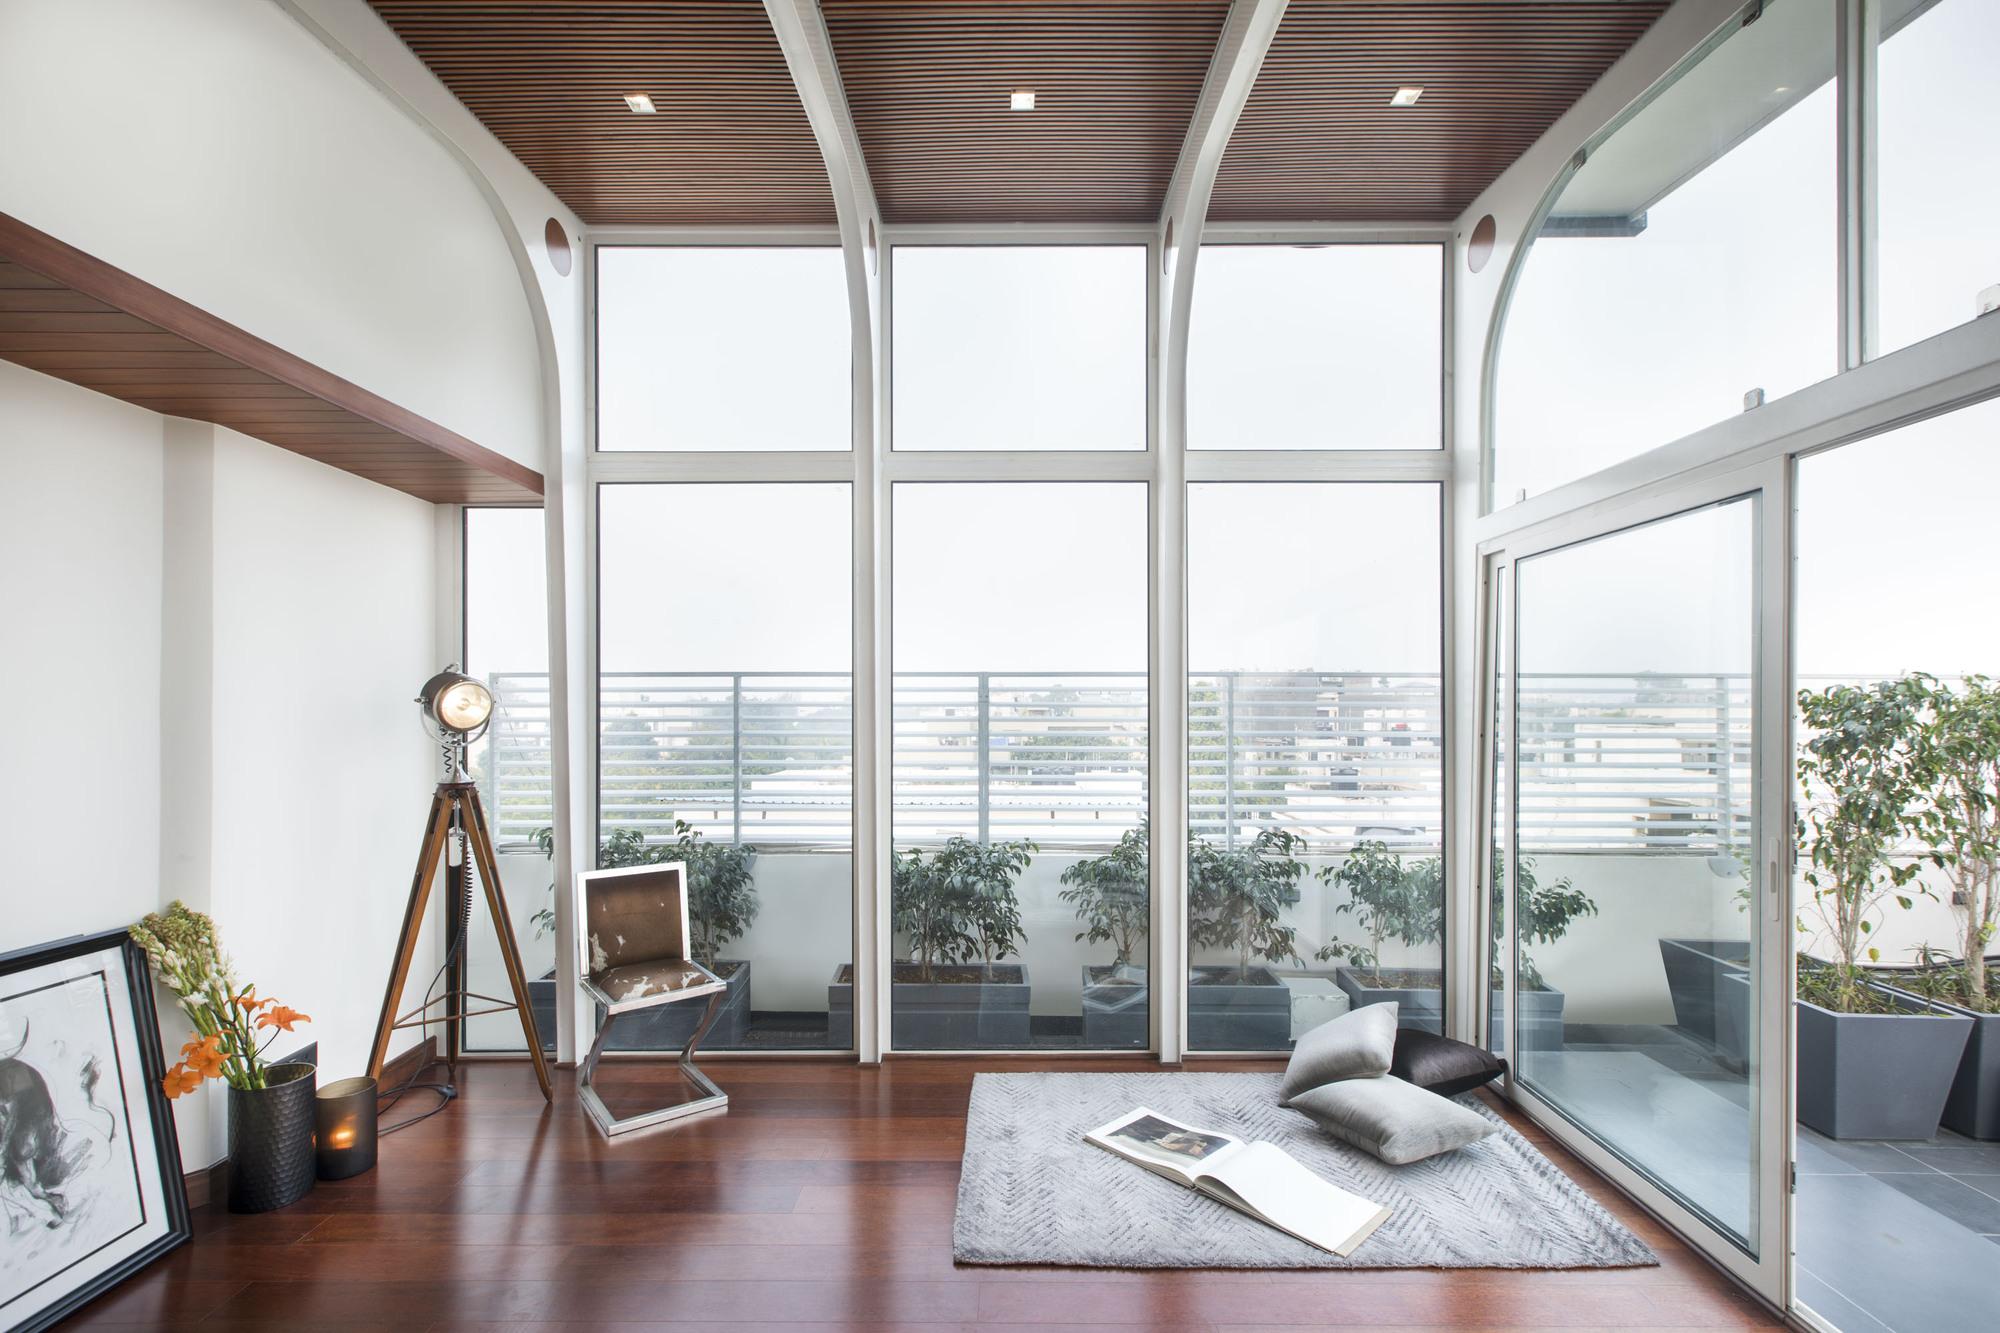 Terrace Folly 2 / Harsh Vardhan Jain Architects